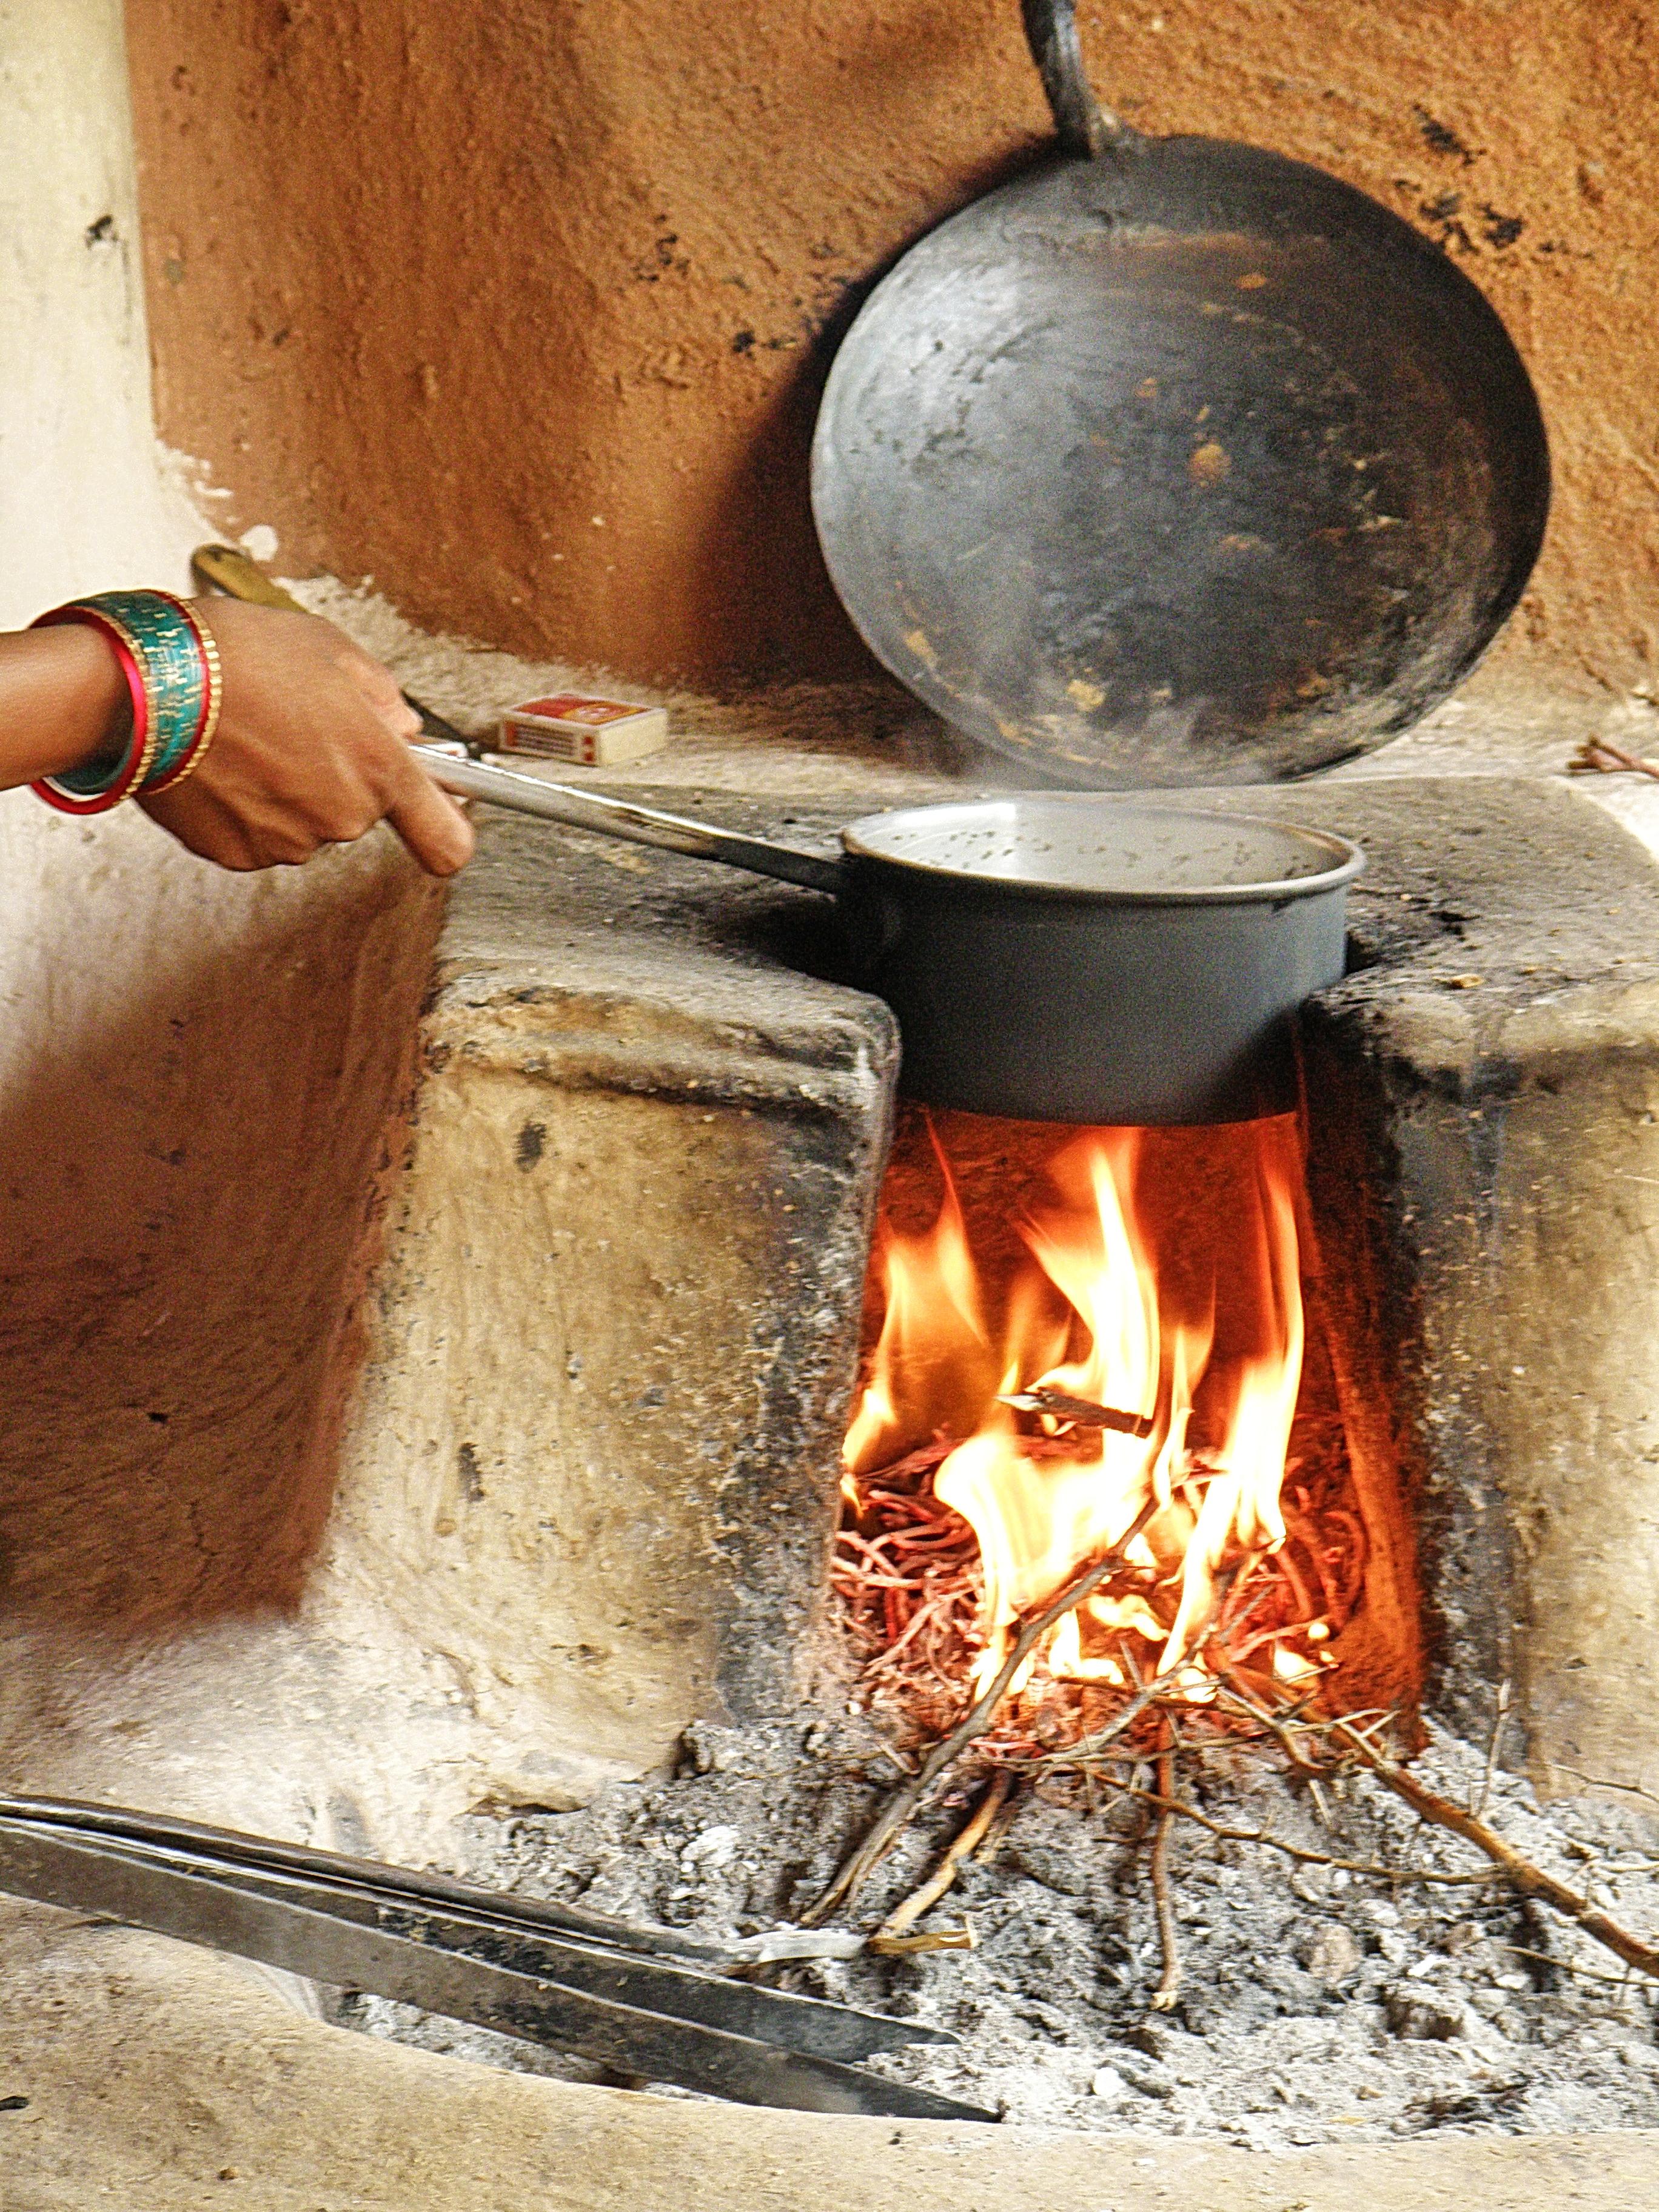 Hochwertig Jodhpur   Vishnoi People   Feuerstelle   Herd